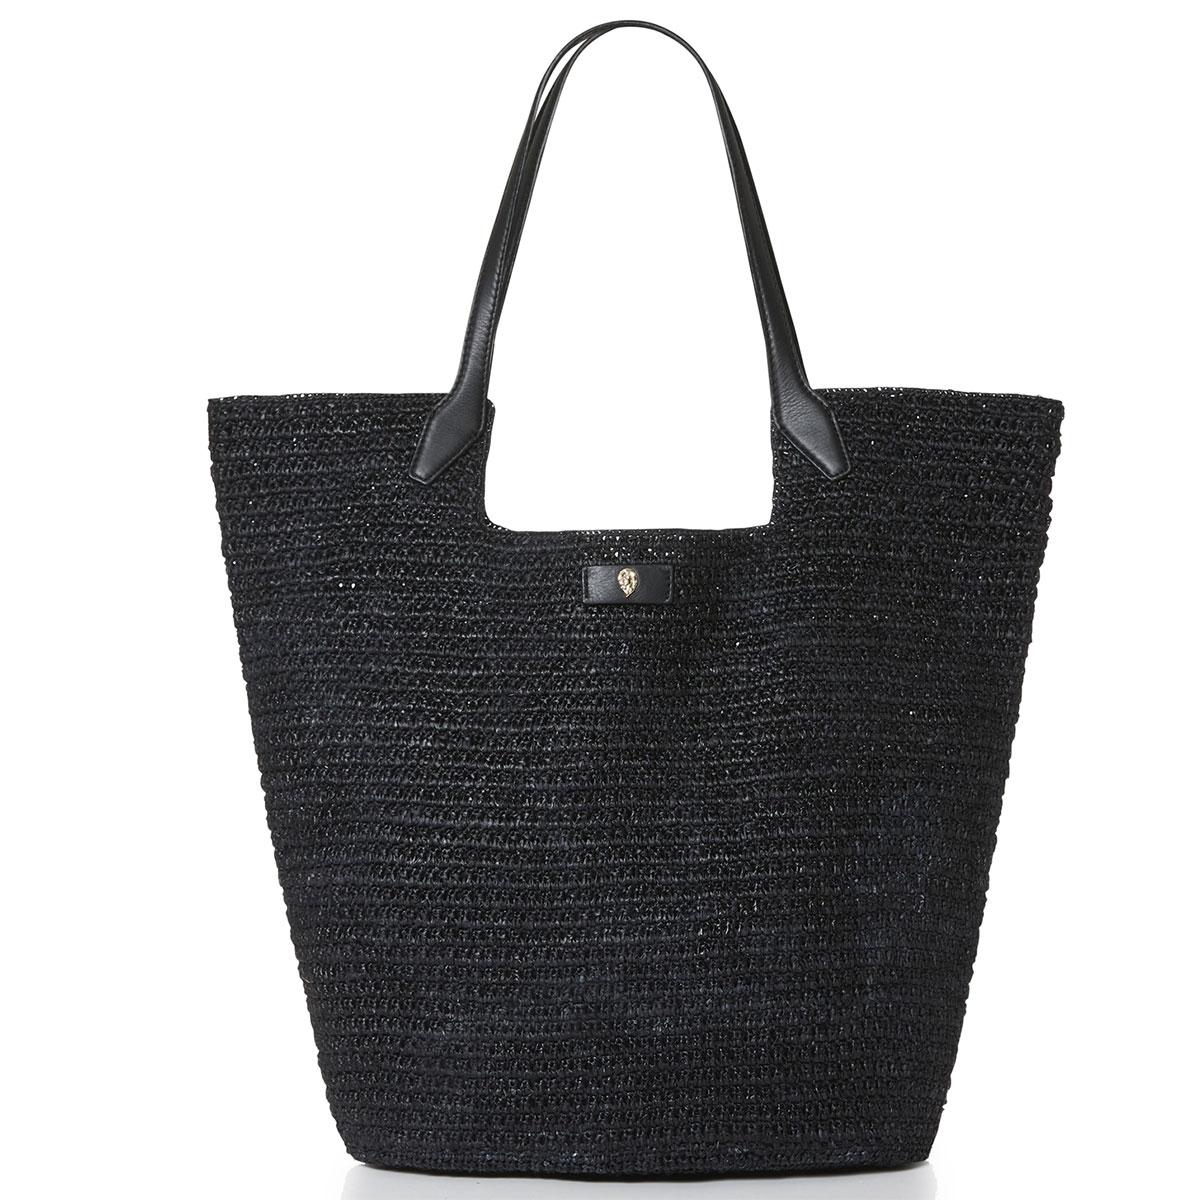 Helen Kaminski Cassia Large Basket in Charcoal,Black